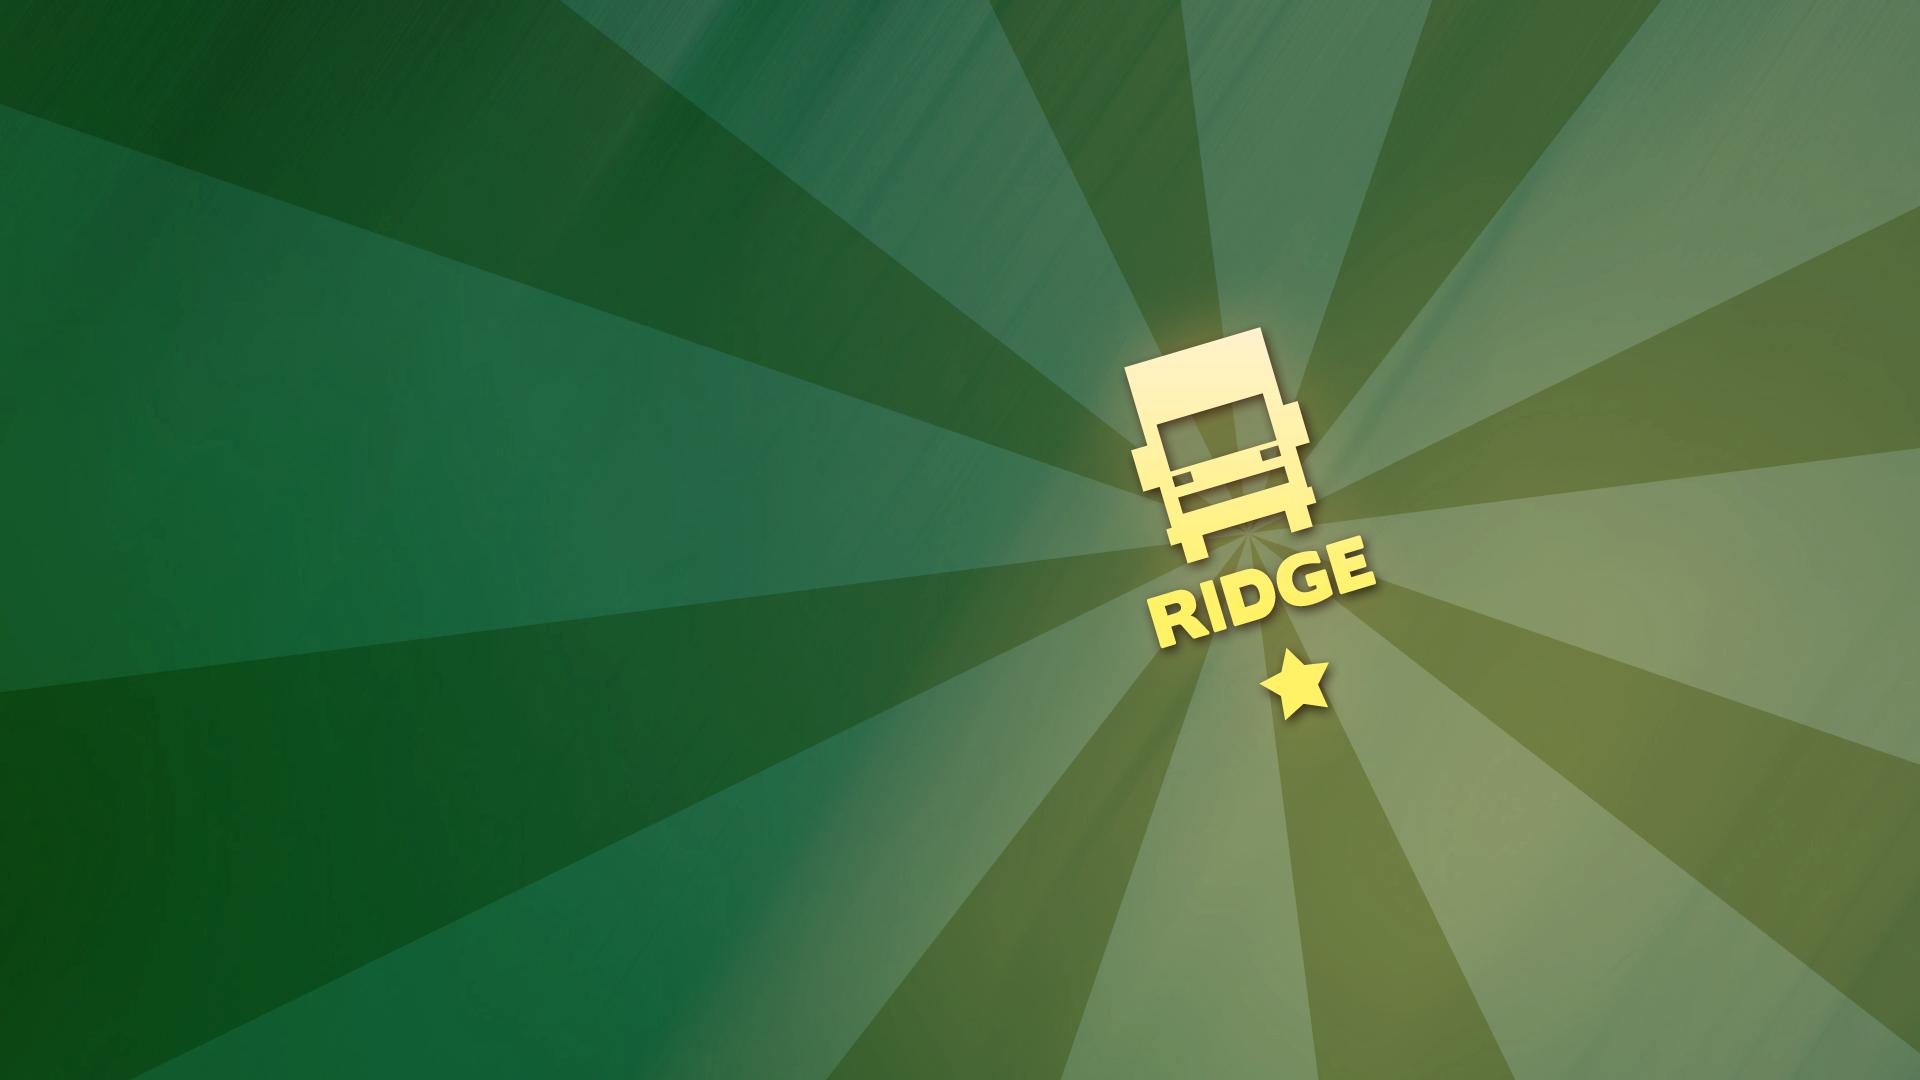 Truck insignia 'Ridge'